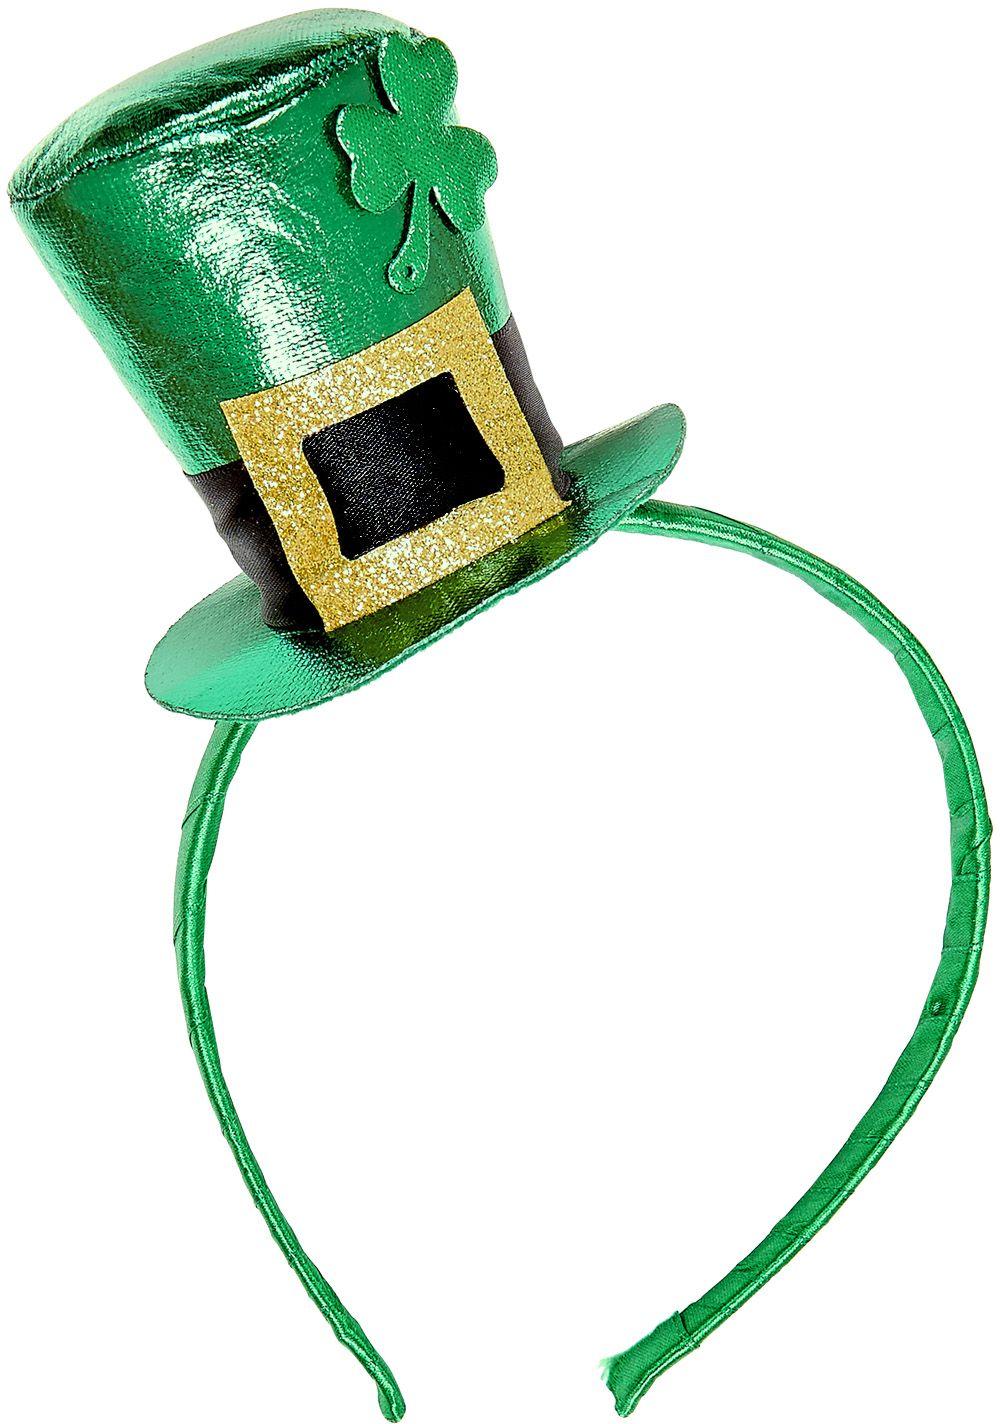 St. Patricksday hoofdband met mini hoedje